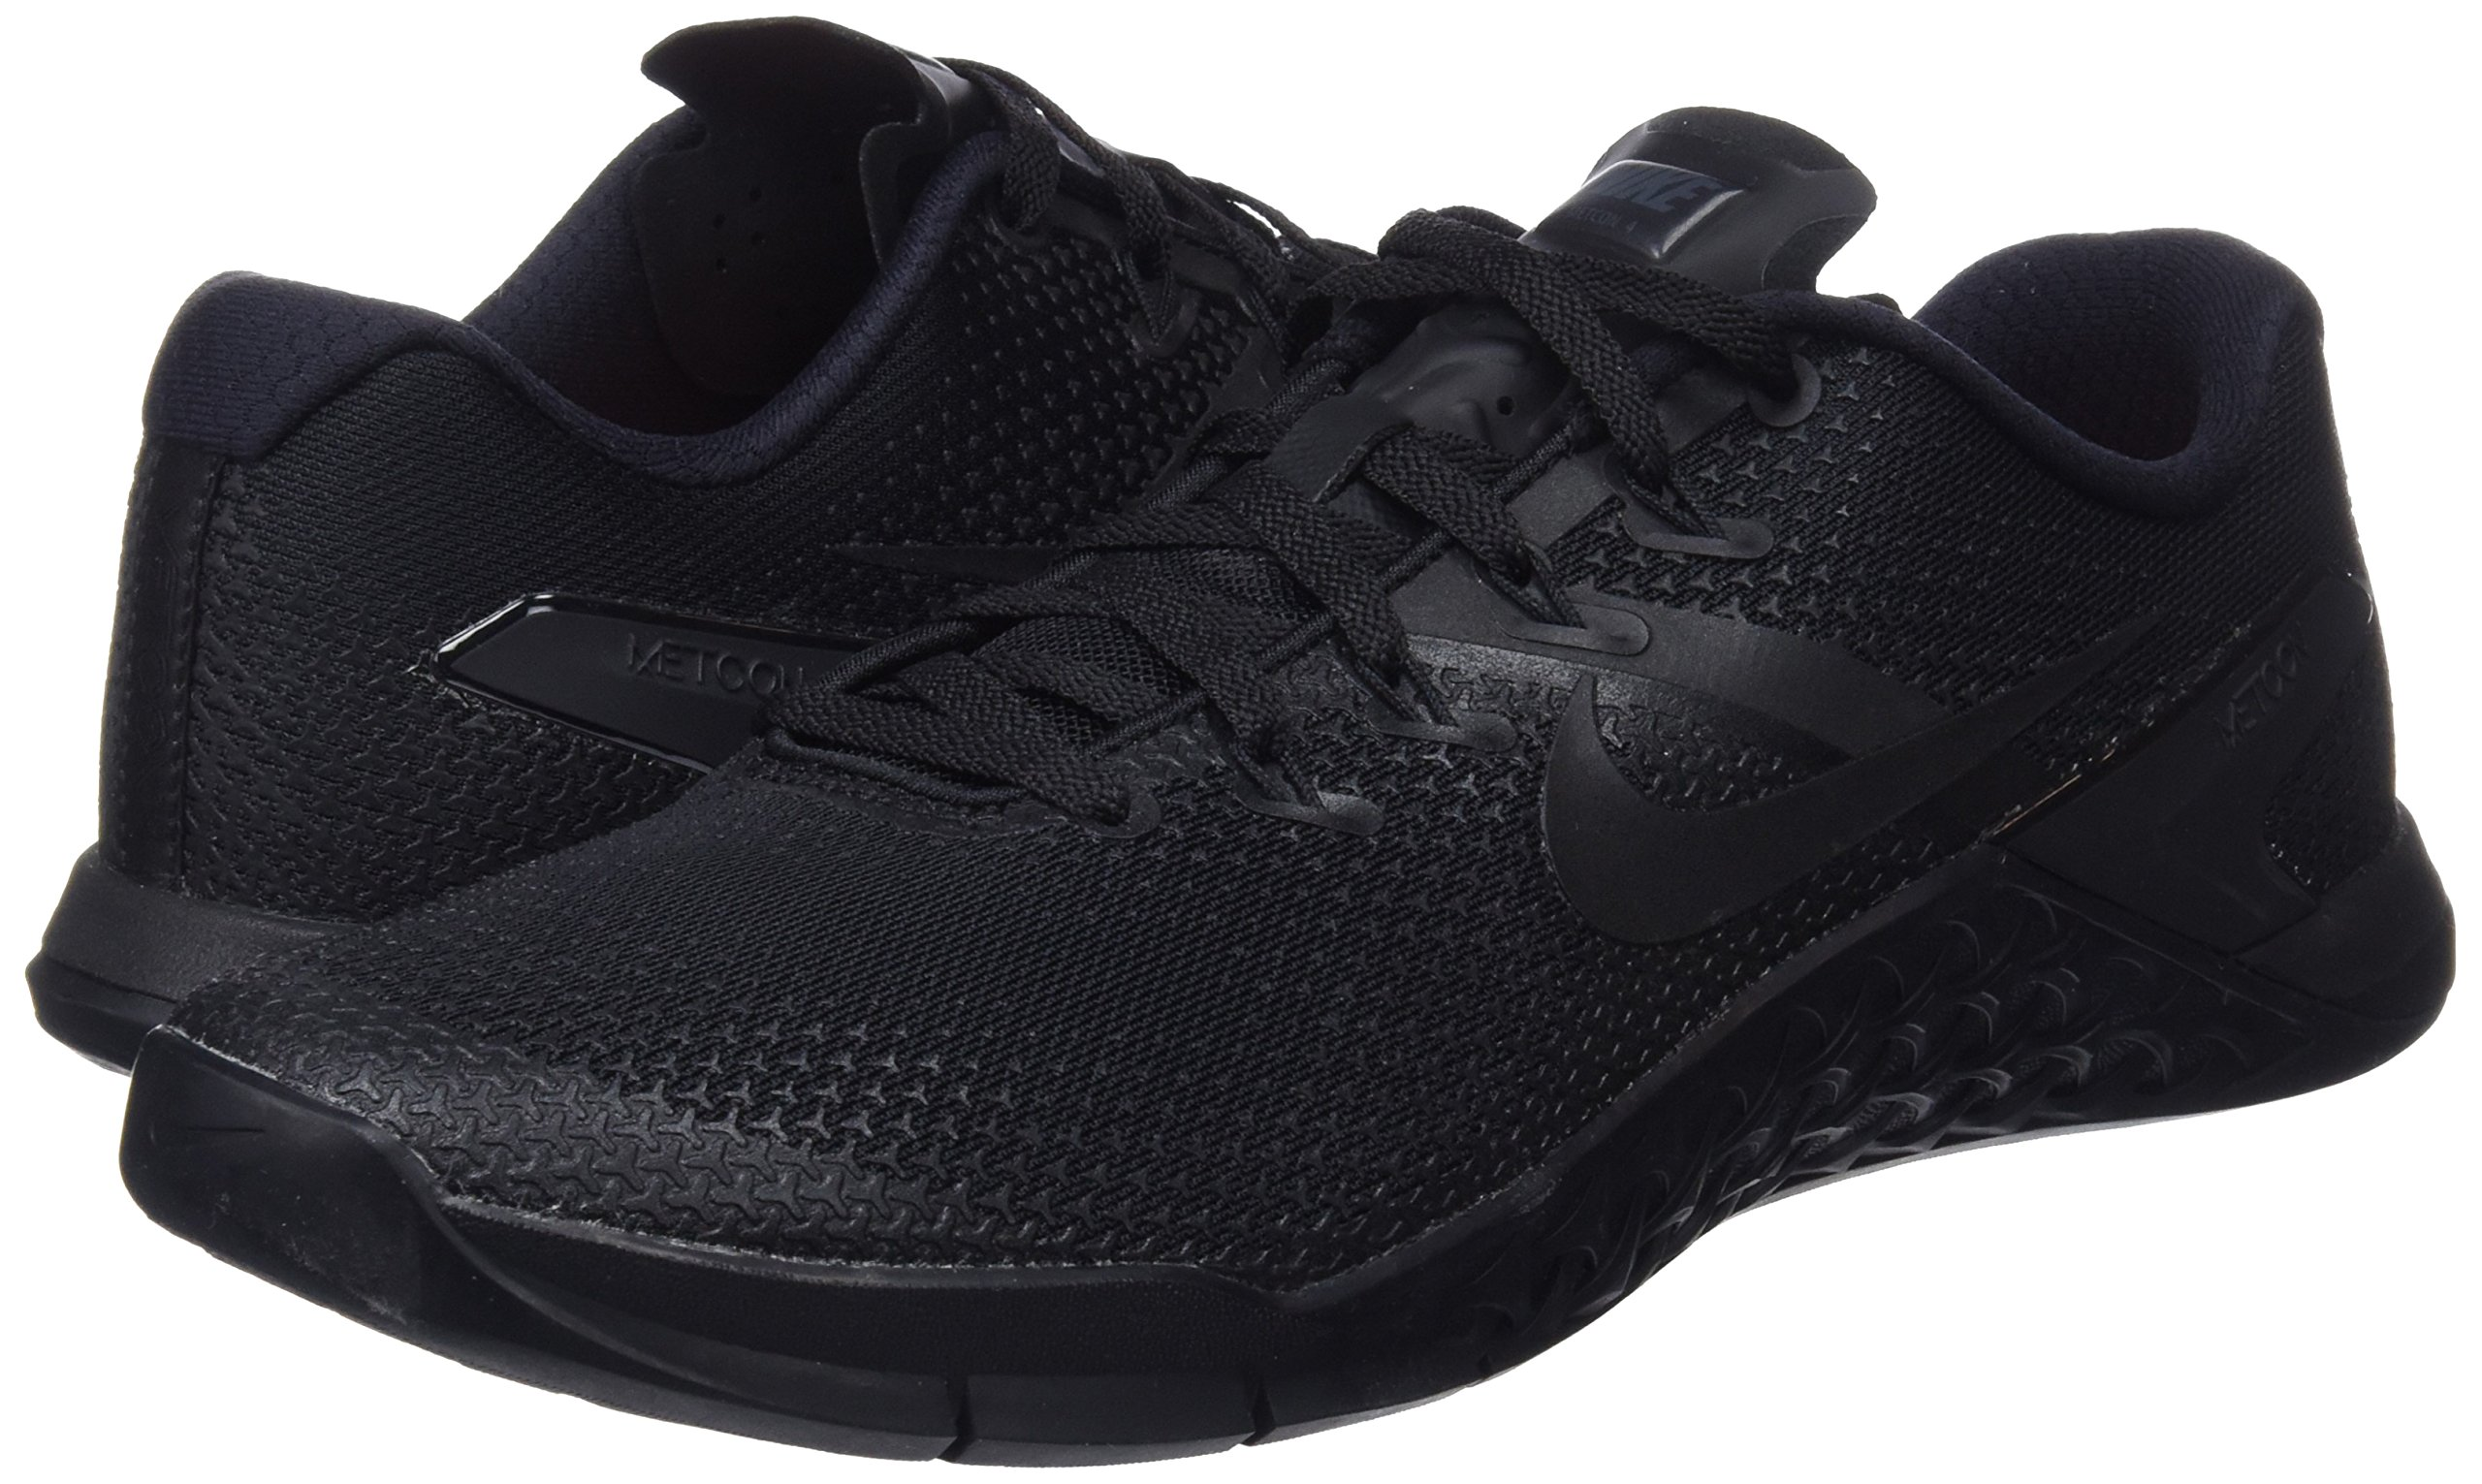 Nike Men's Metcon 4 Training Shoe Black/Black-Black-Hyper Crimson 7.5 by Nike (Image #5)